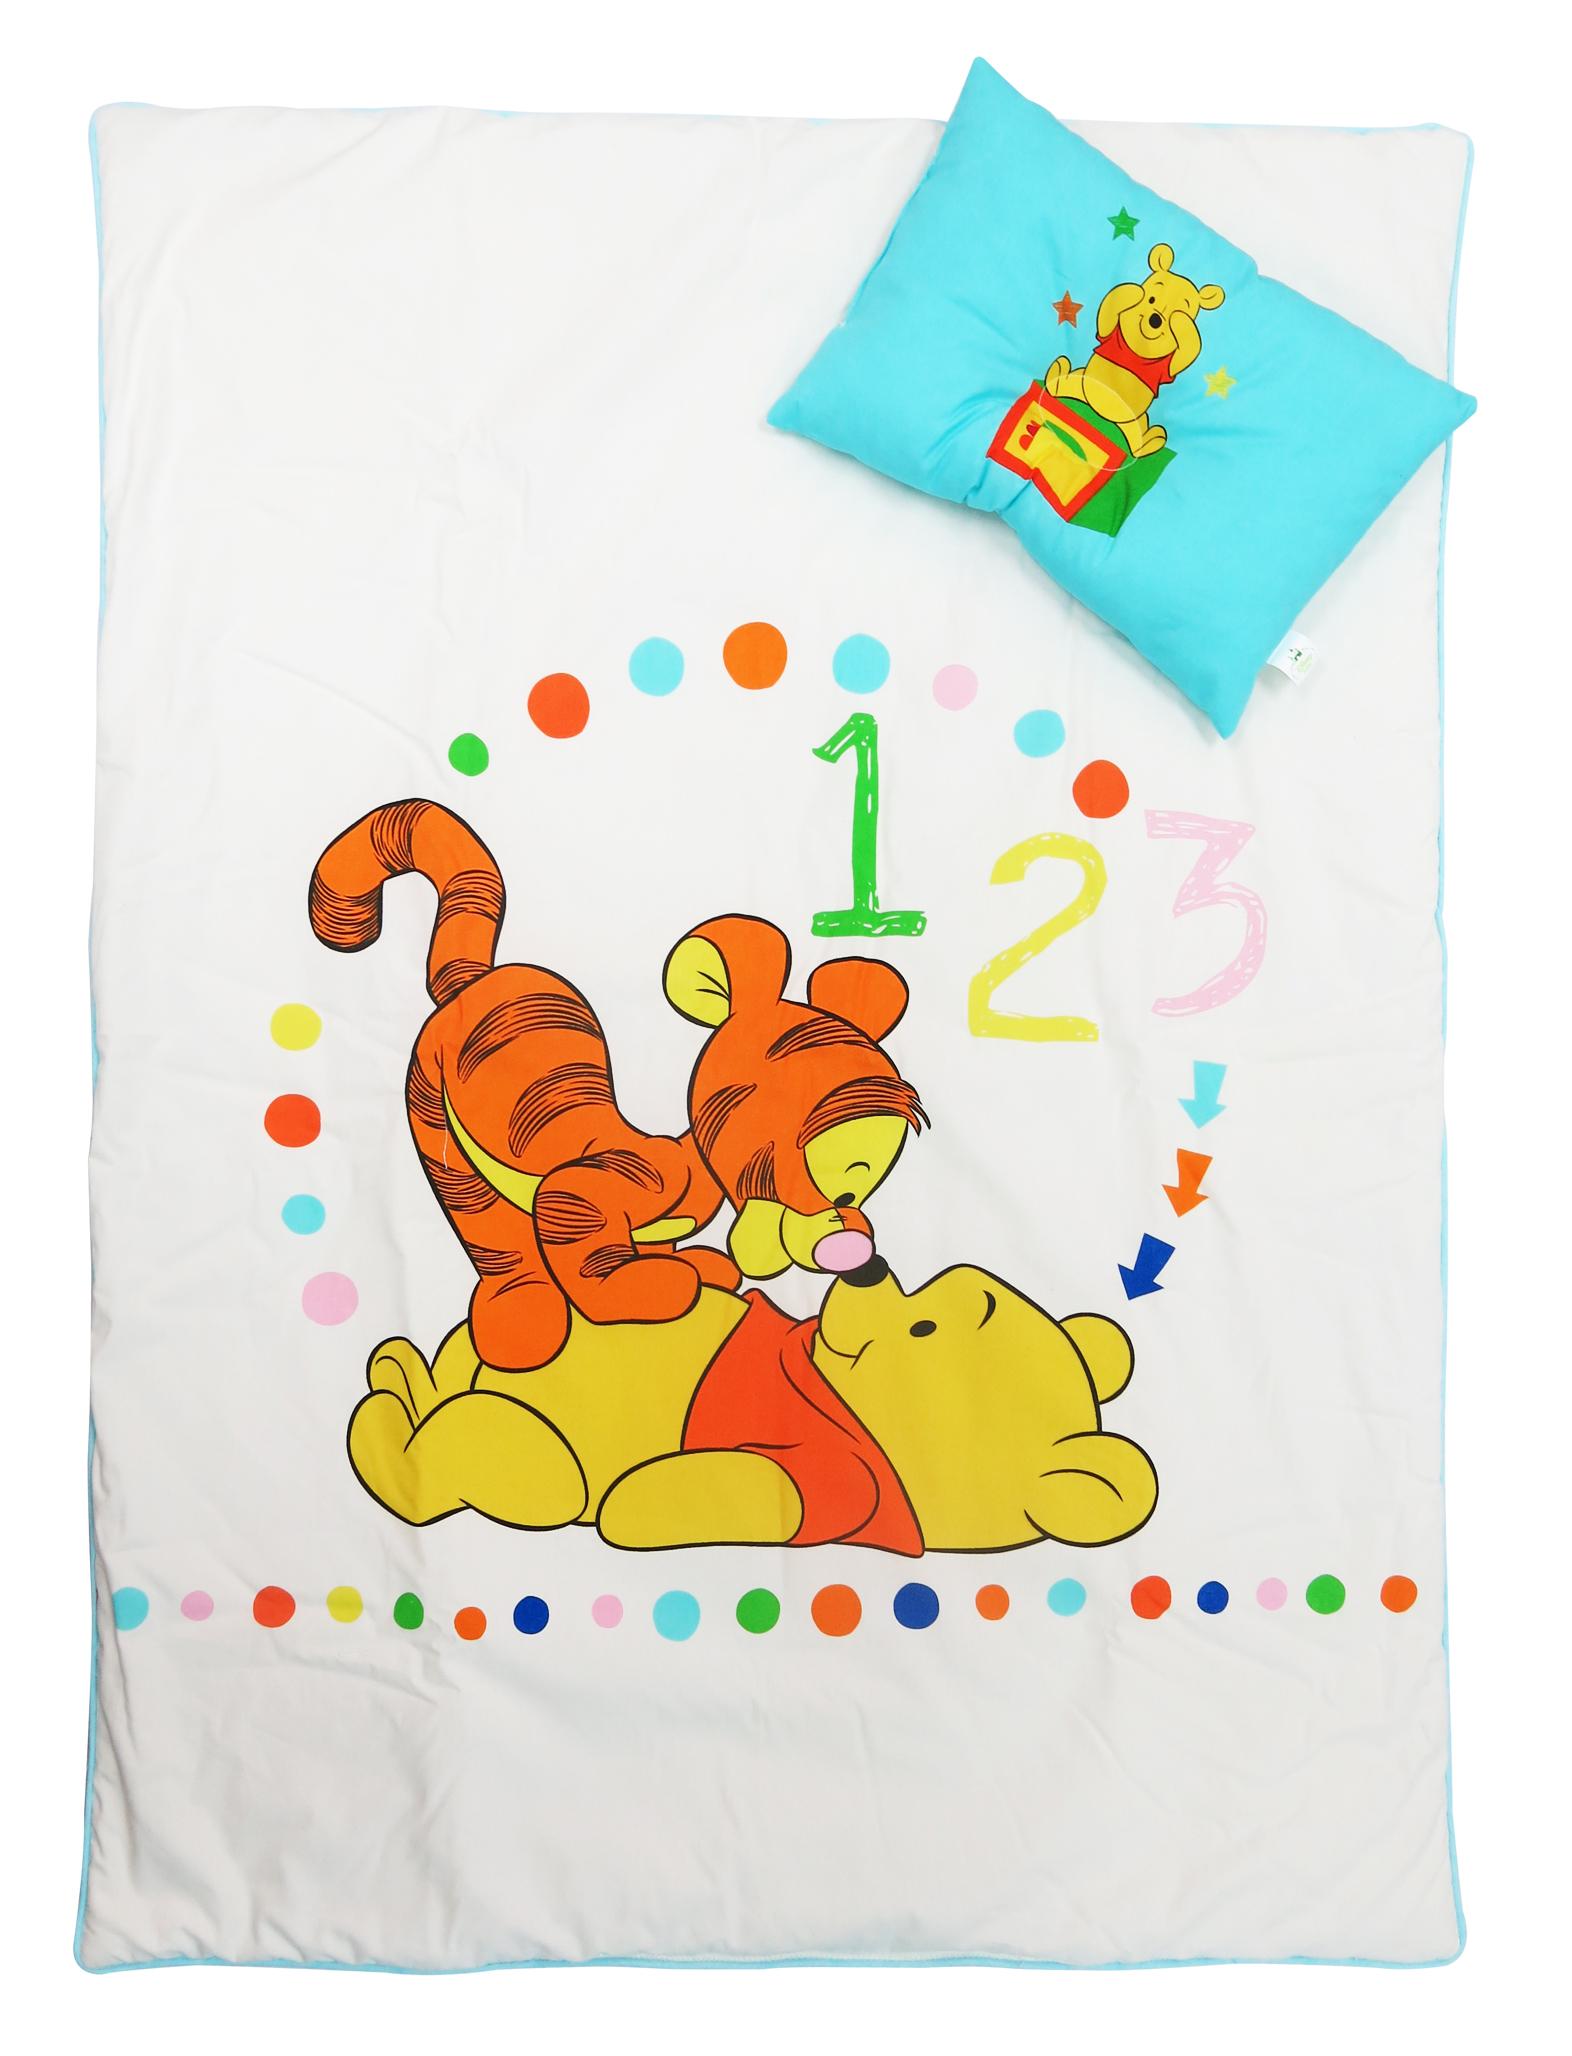 Pooh Ready to play ผ้าห่มนวมหนา 30*40 นิ้ว